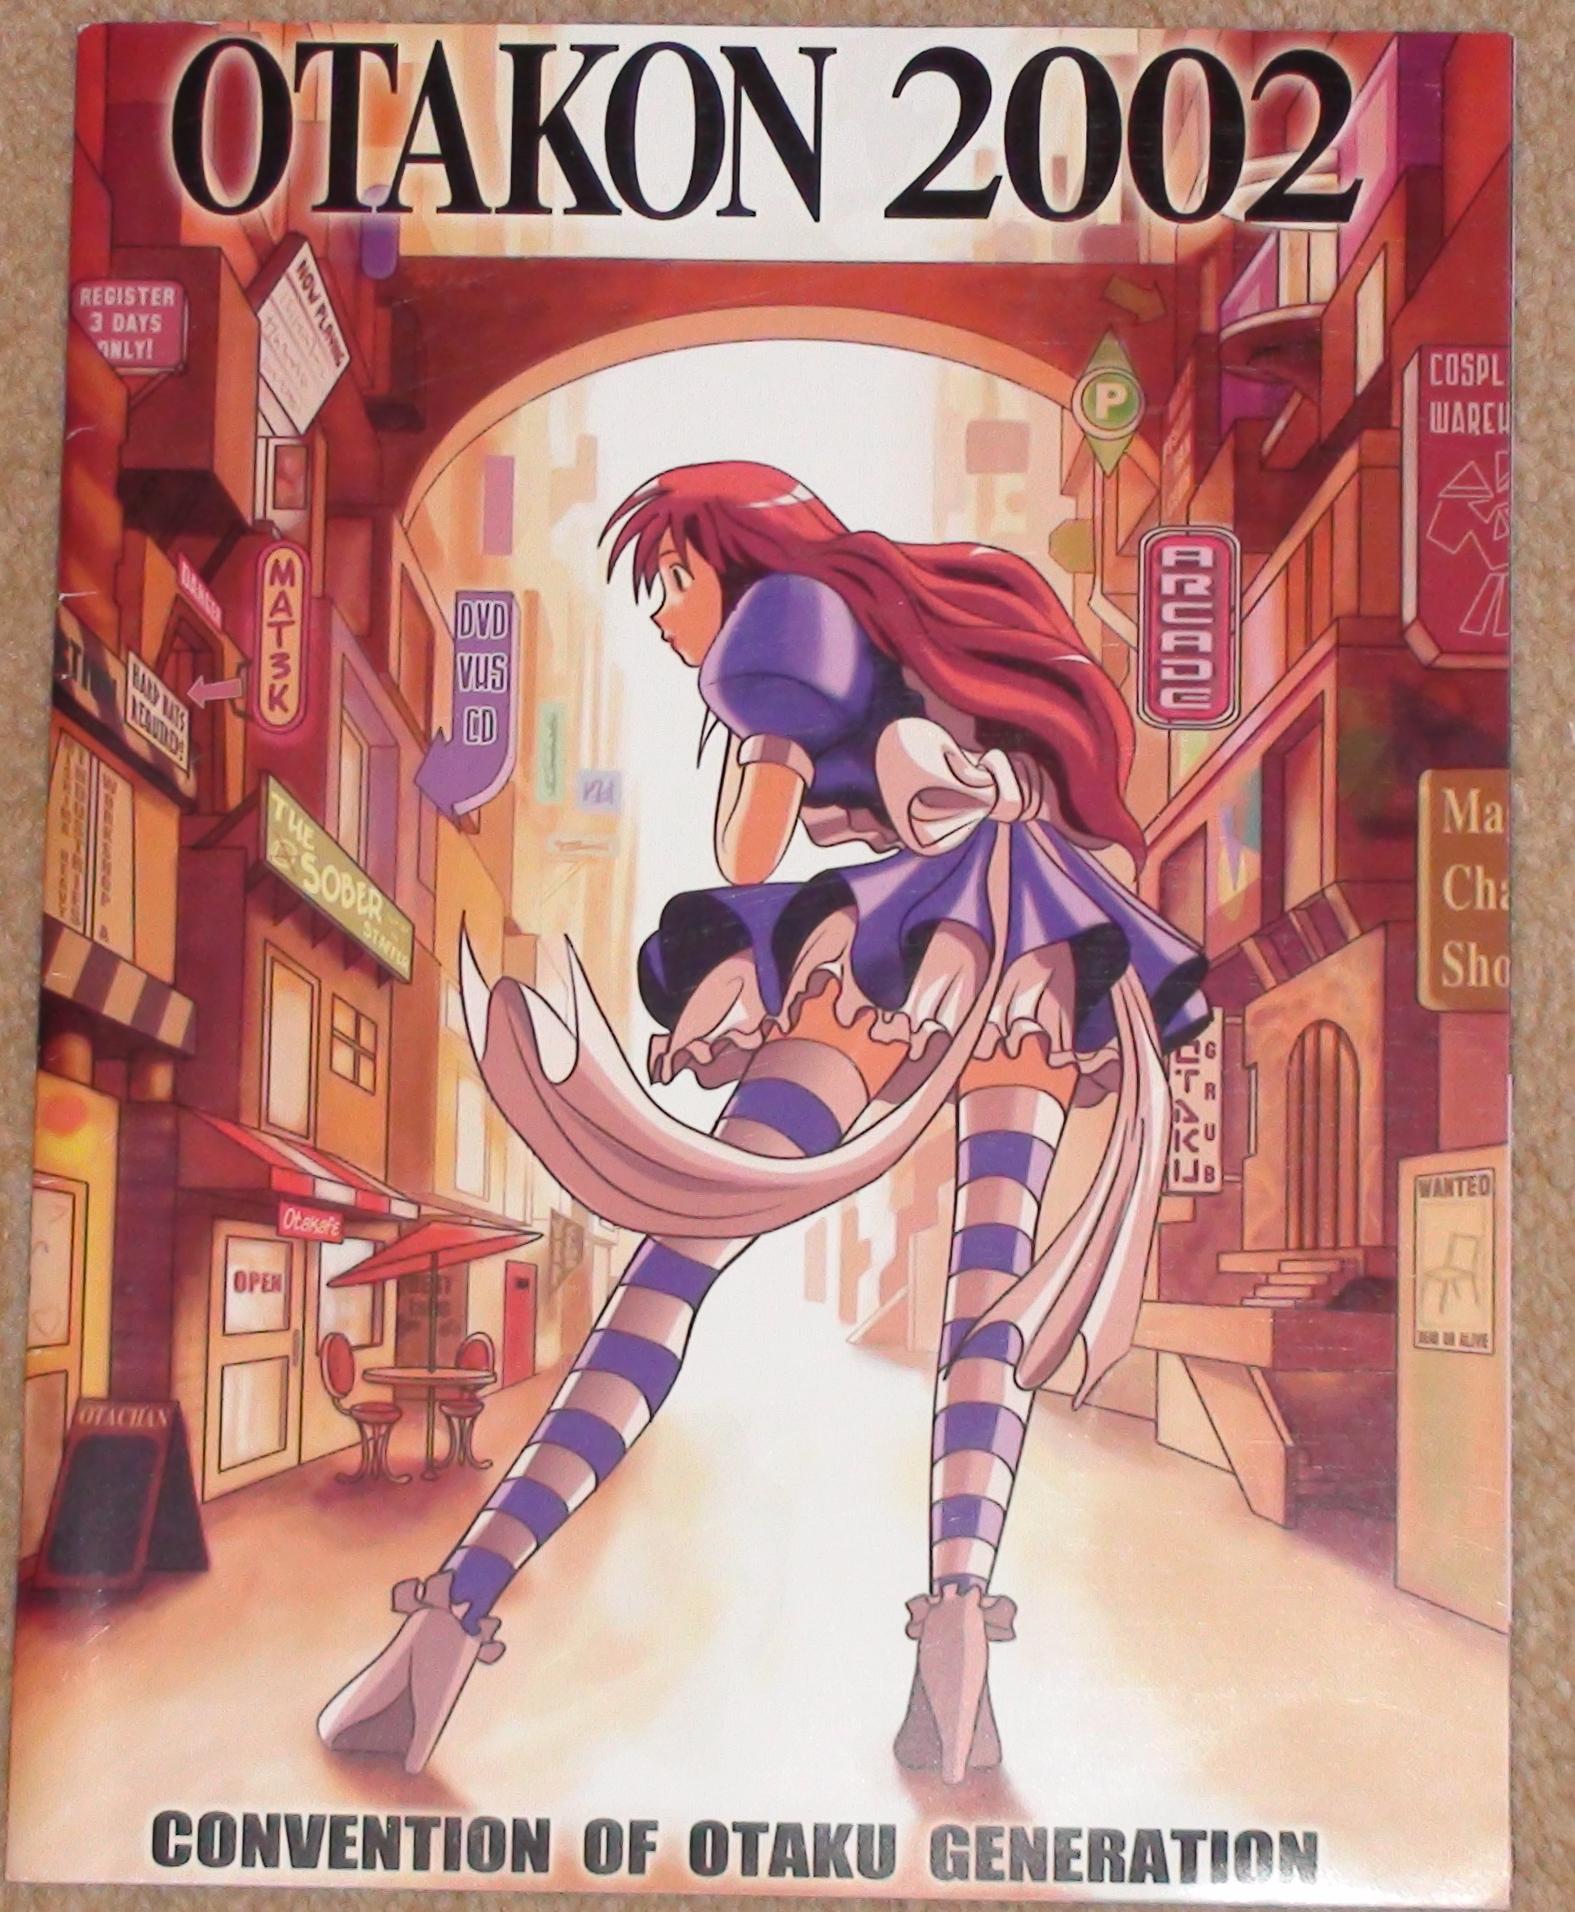 Otakon 2002 - Yasuhirow Nightow